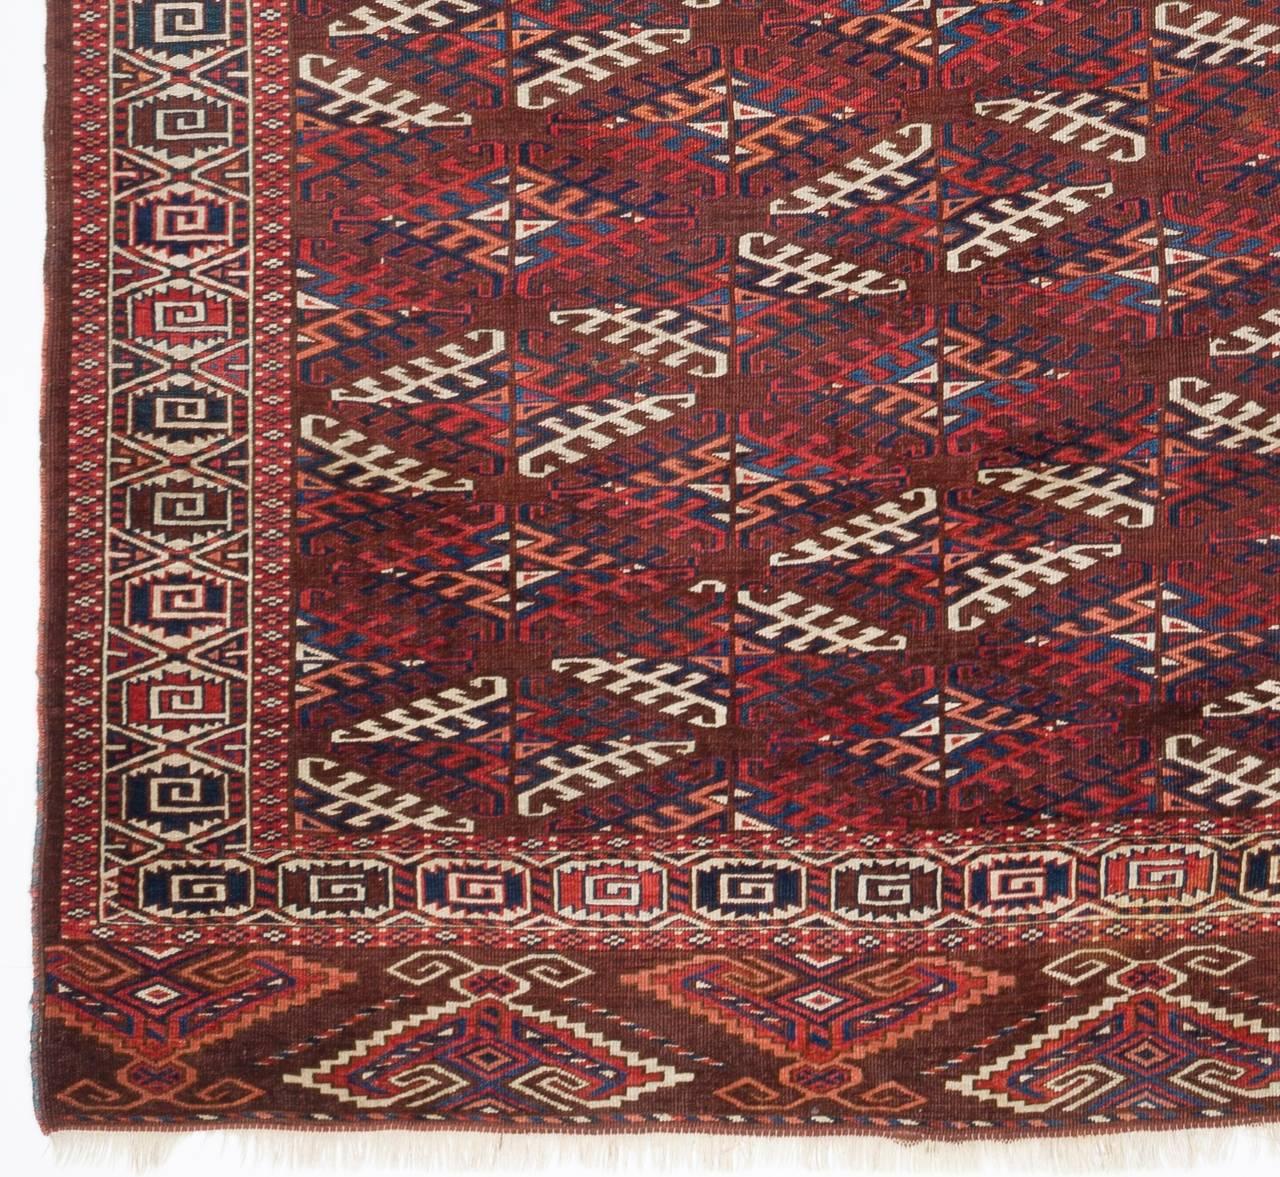 Antique Turkoman Rug: Antique Turkoman Yomut Main Carpet, 19th Century For Sale